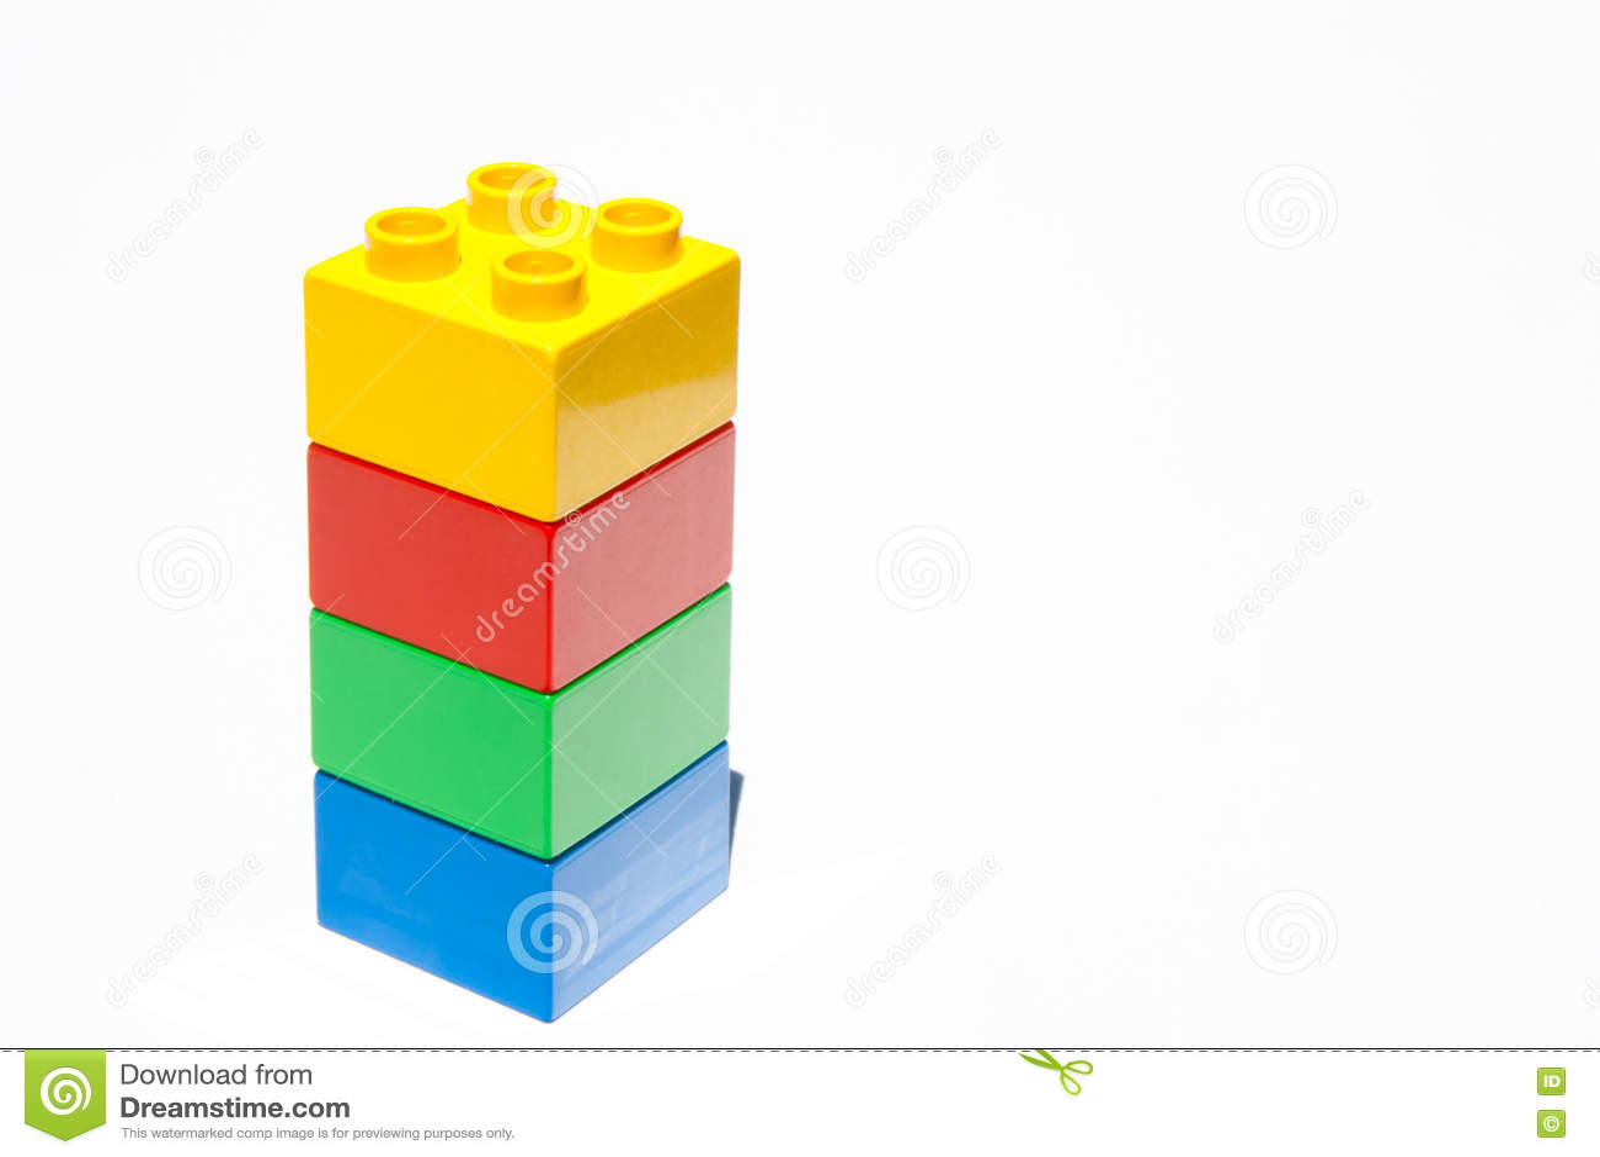 Lego building blocks stock image  Image of green, childhood - 74344855